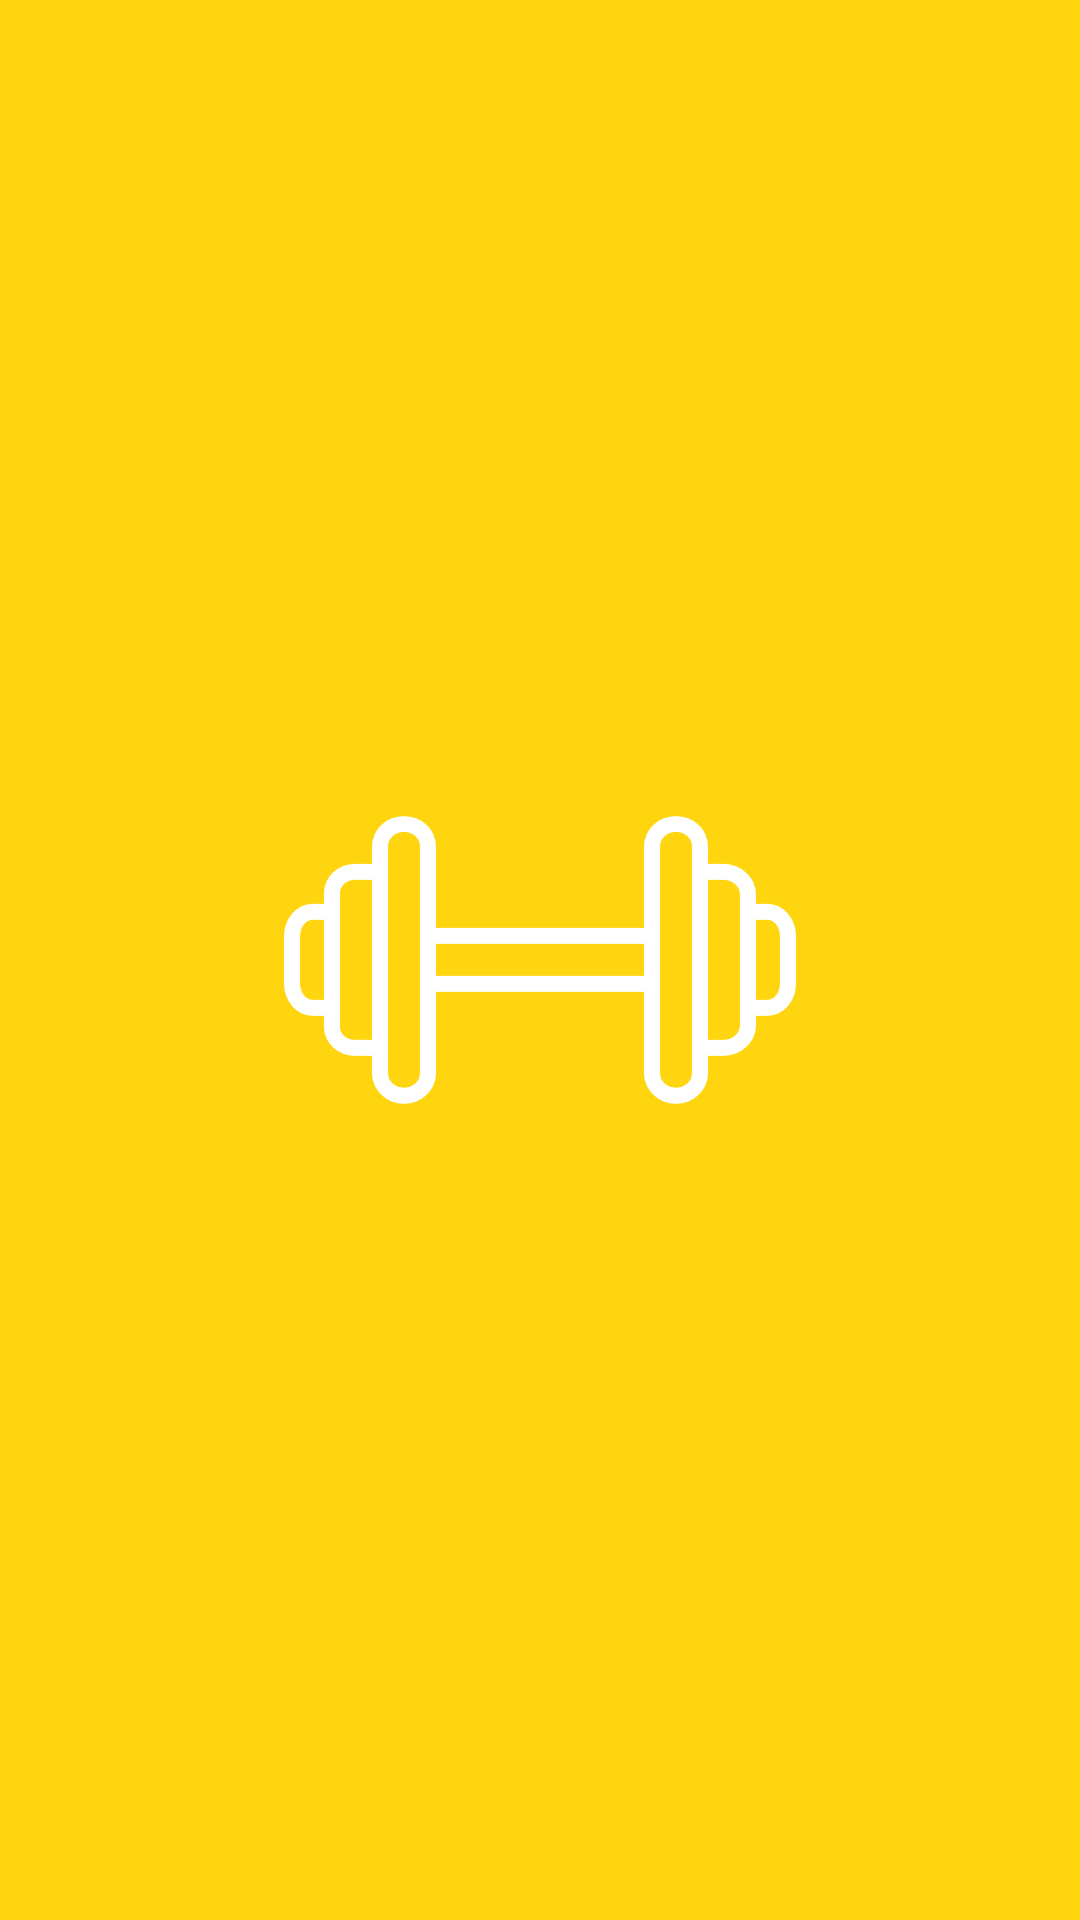 Yellow Instagram Highlight Icons Iconos de instagram